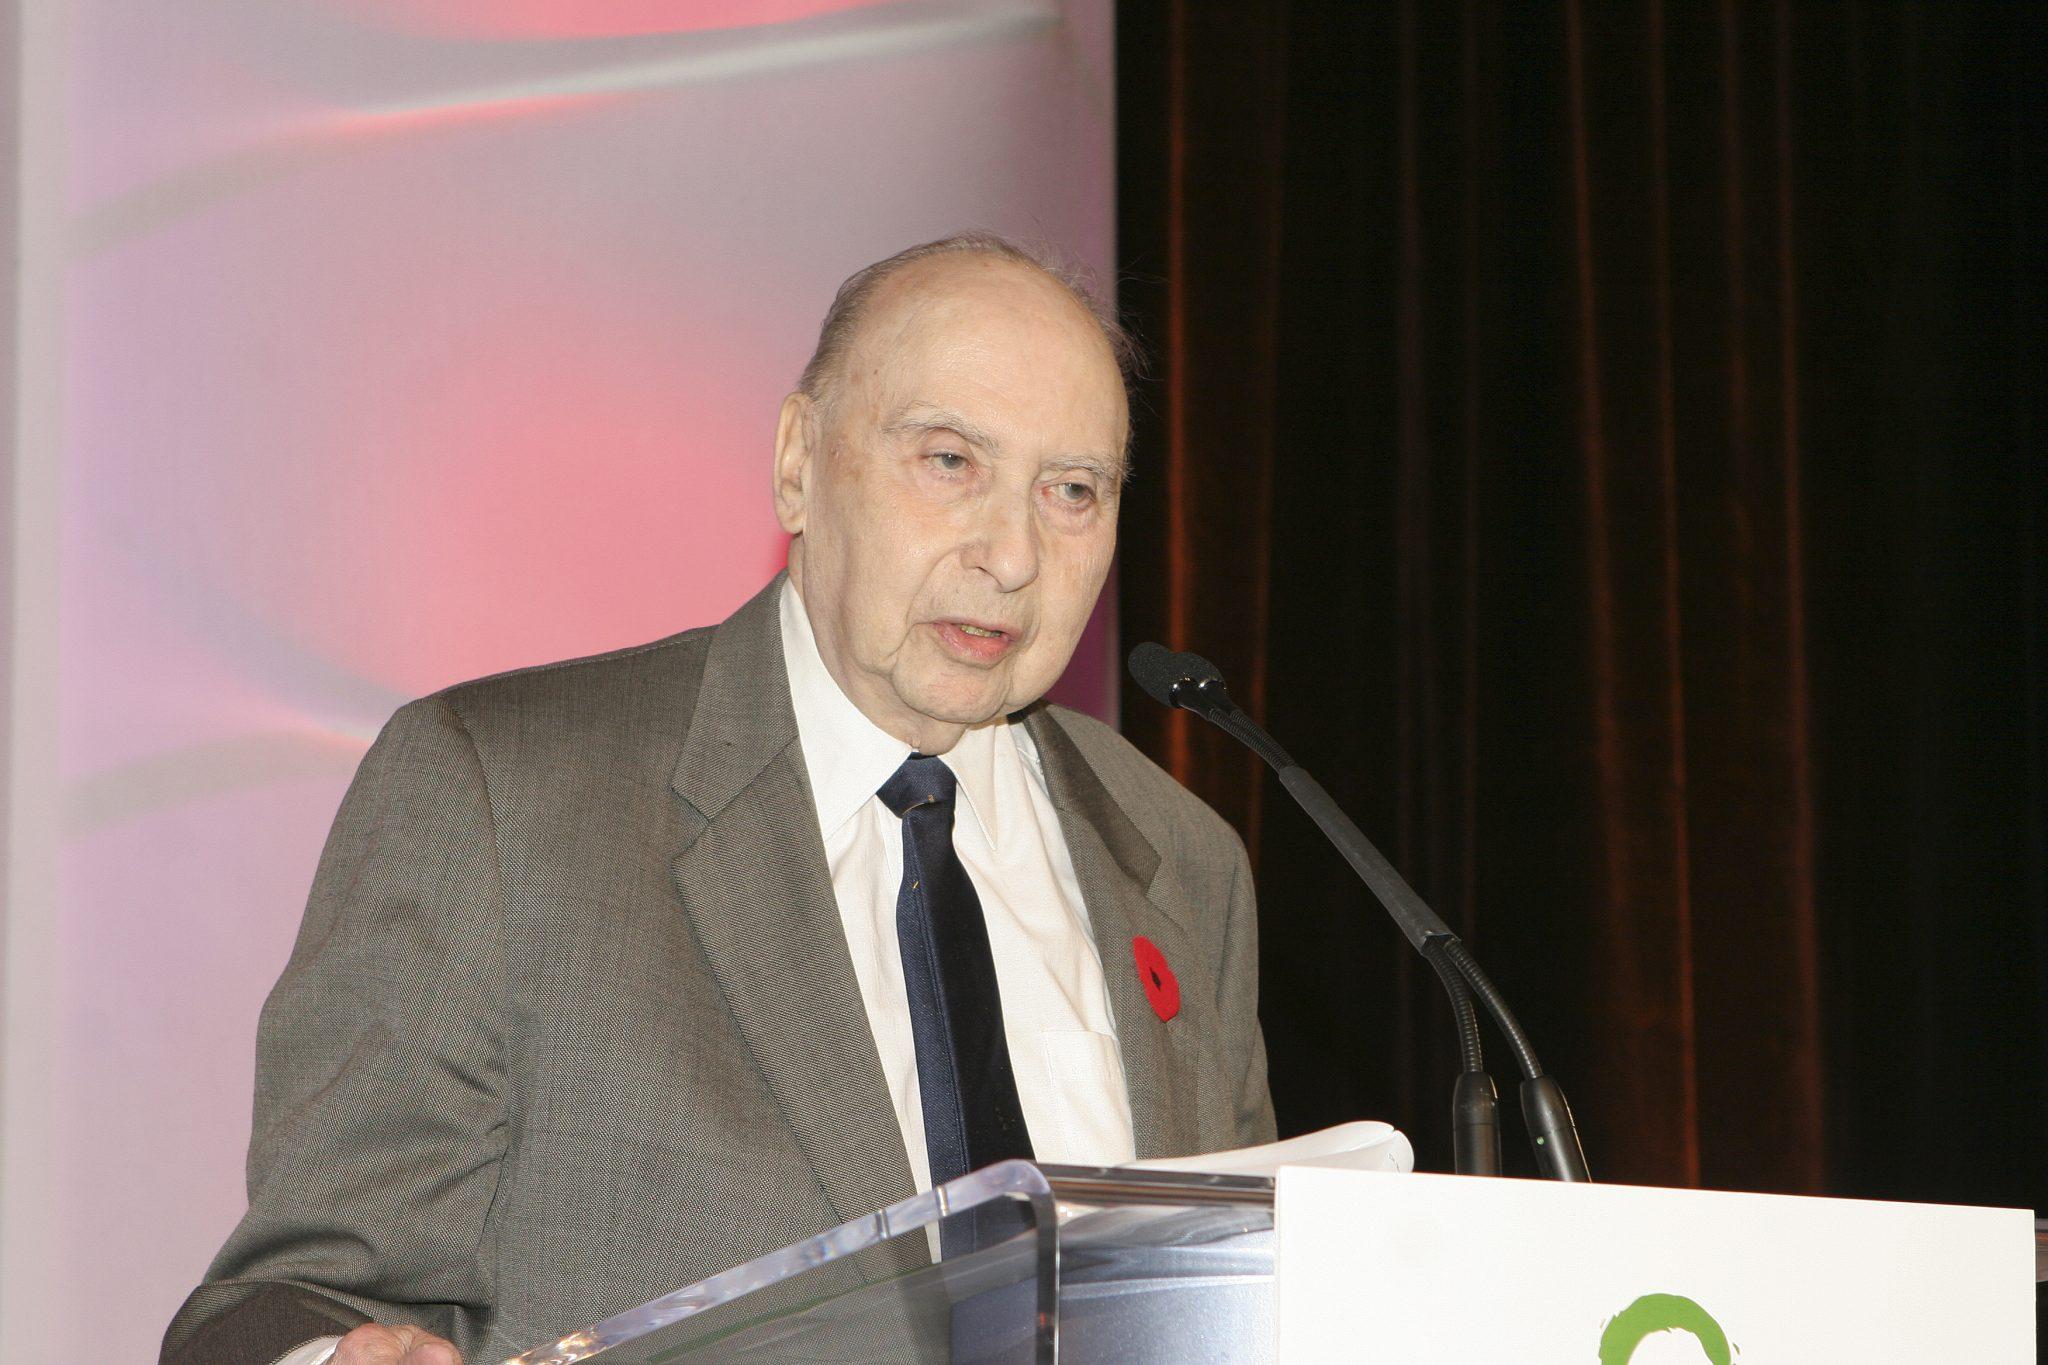 2007 Dr. Rogers Prize Winner Dr. Abram Hoffer